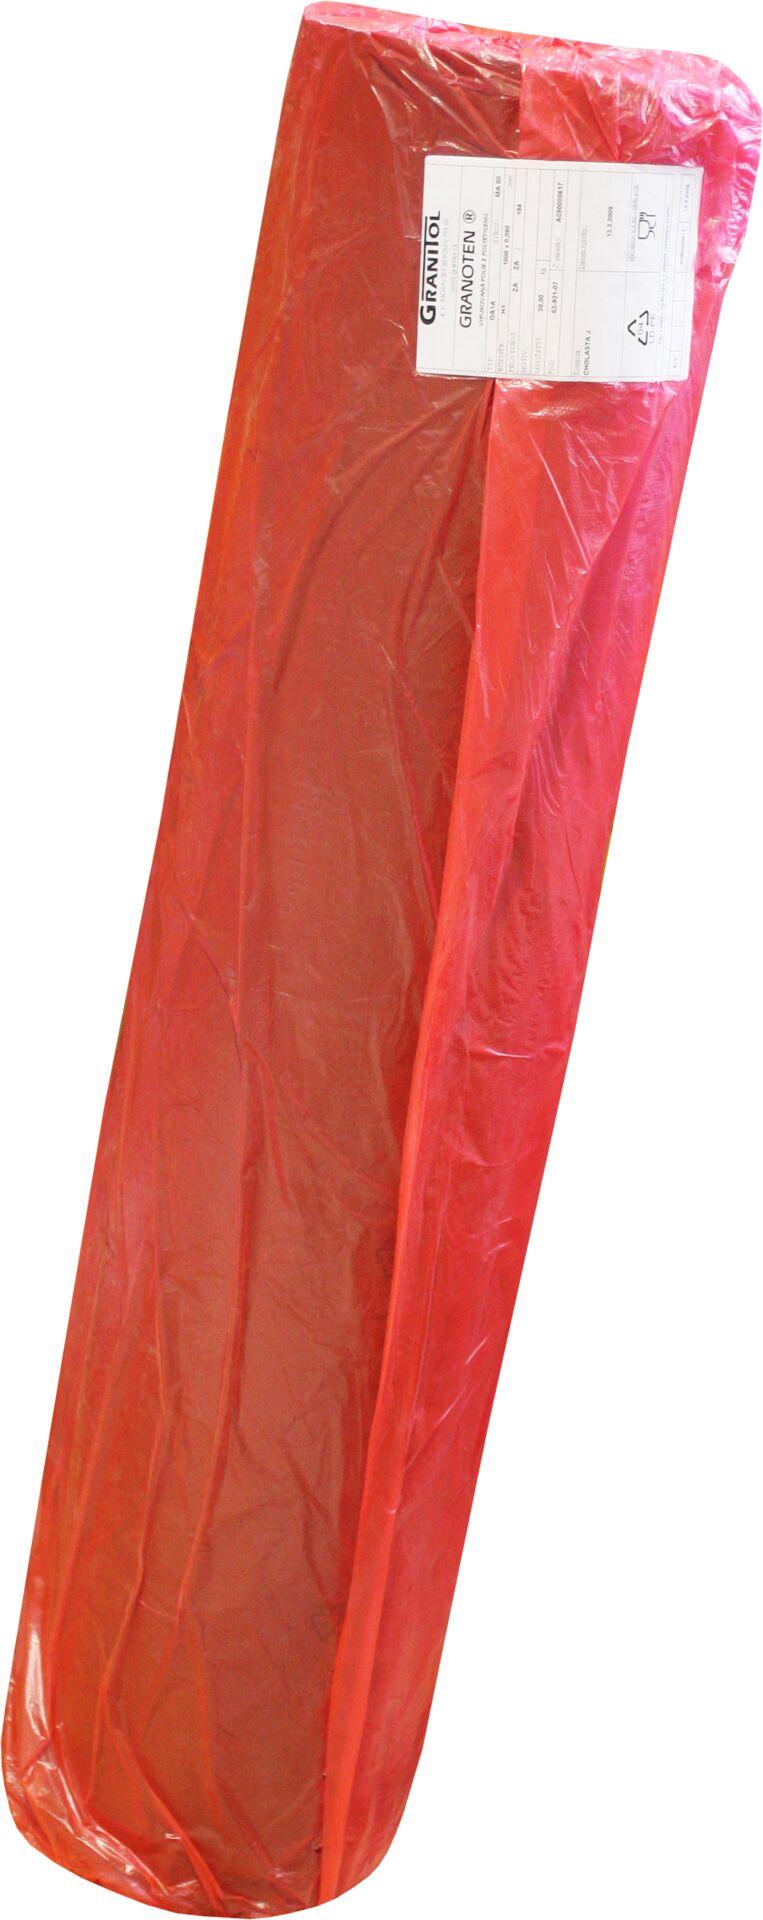 Folie hadice 1 m 0,09 - černá (hmotnost brutto) - 30 kg